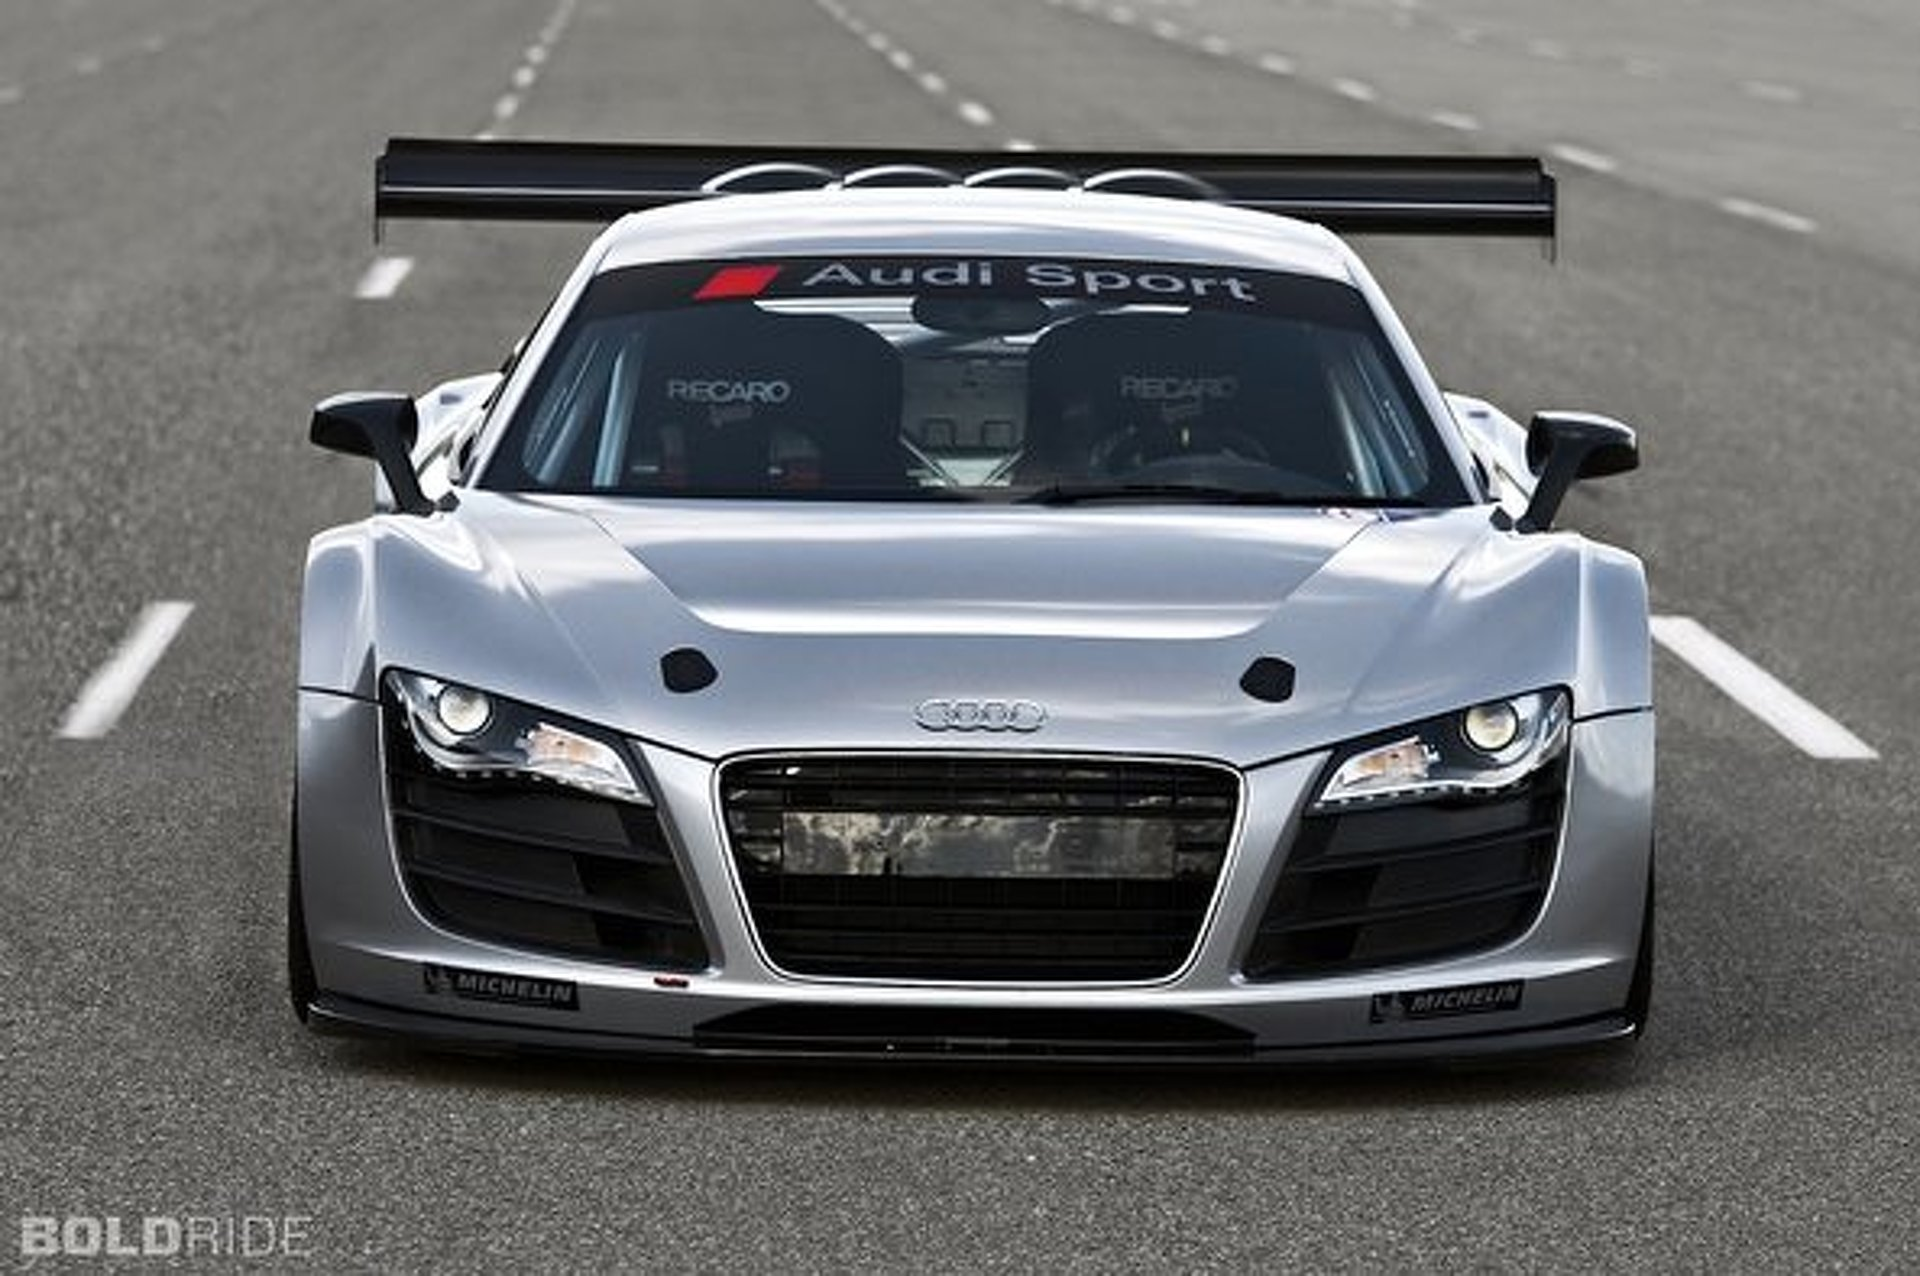 Audi Considering Race-Bred R10 Hypercar- Let the Games Begin